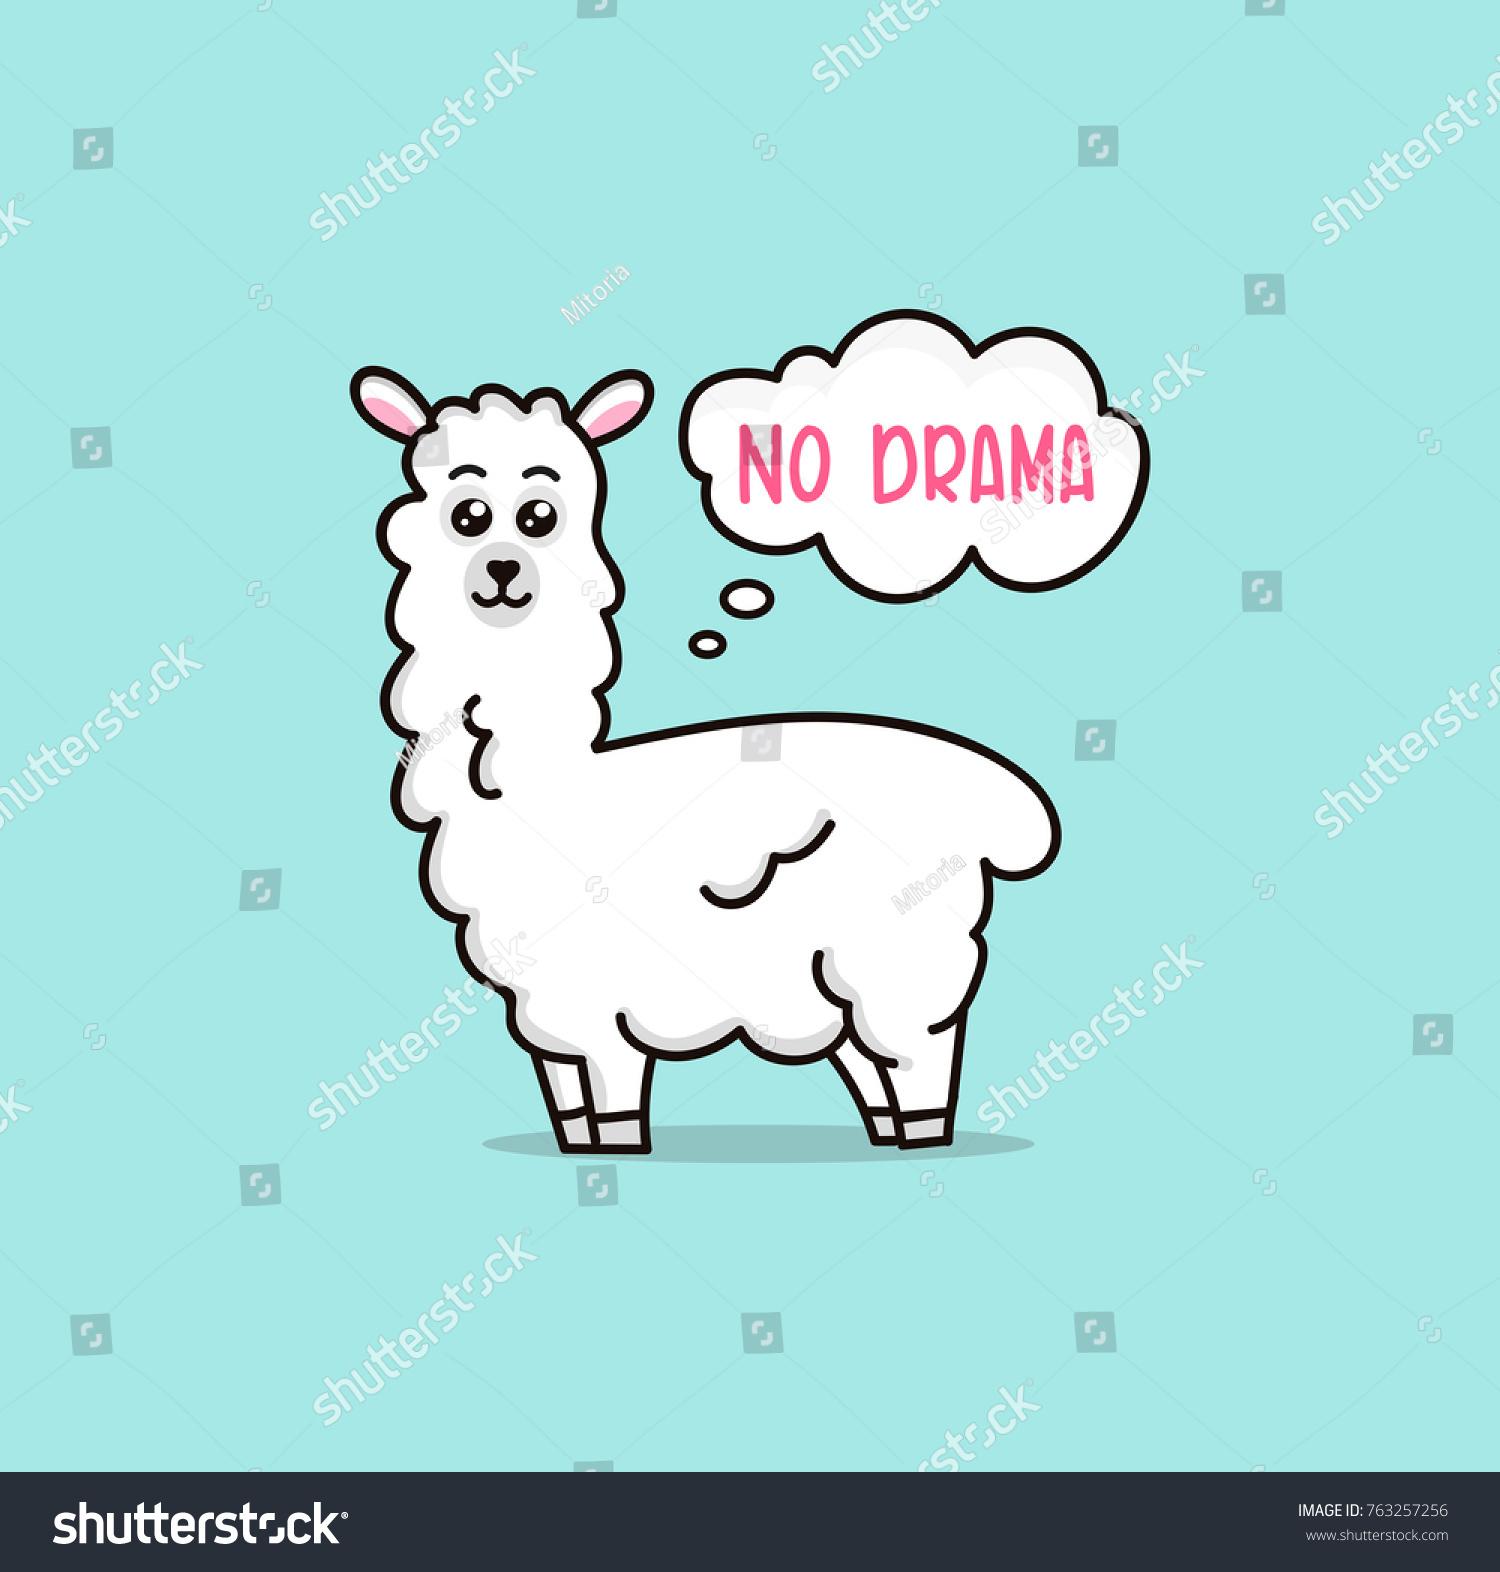 Llamas Quotes Inspirational: No Drama Llama Vector Quote Doodles Stock Vector 763257256